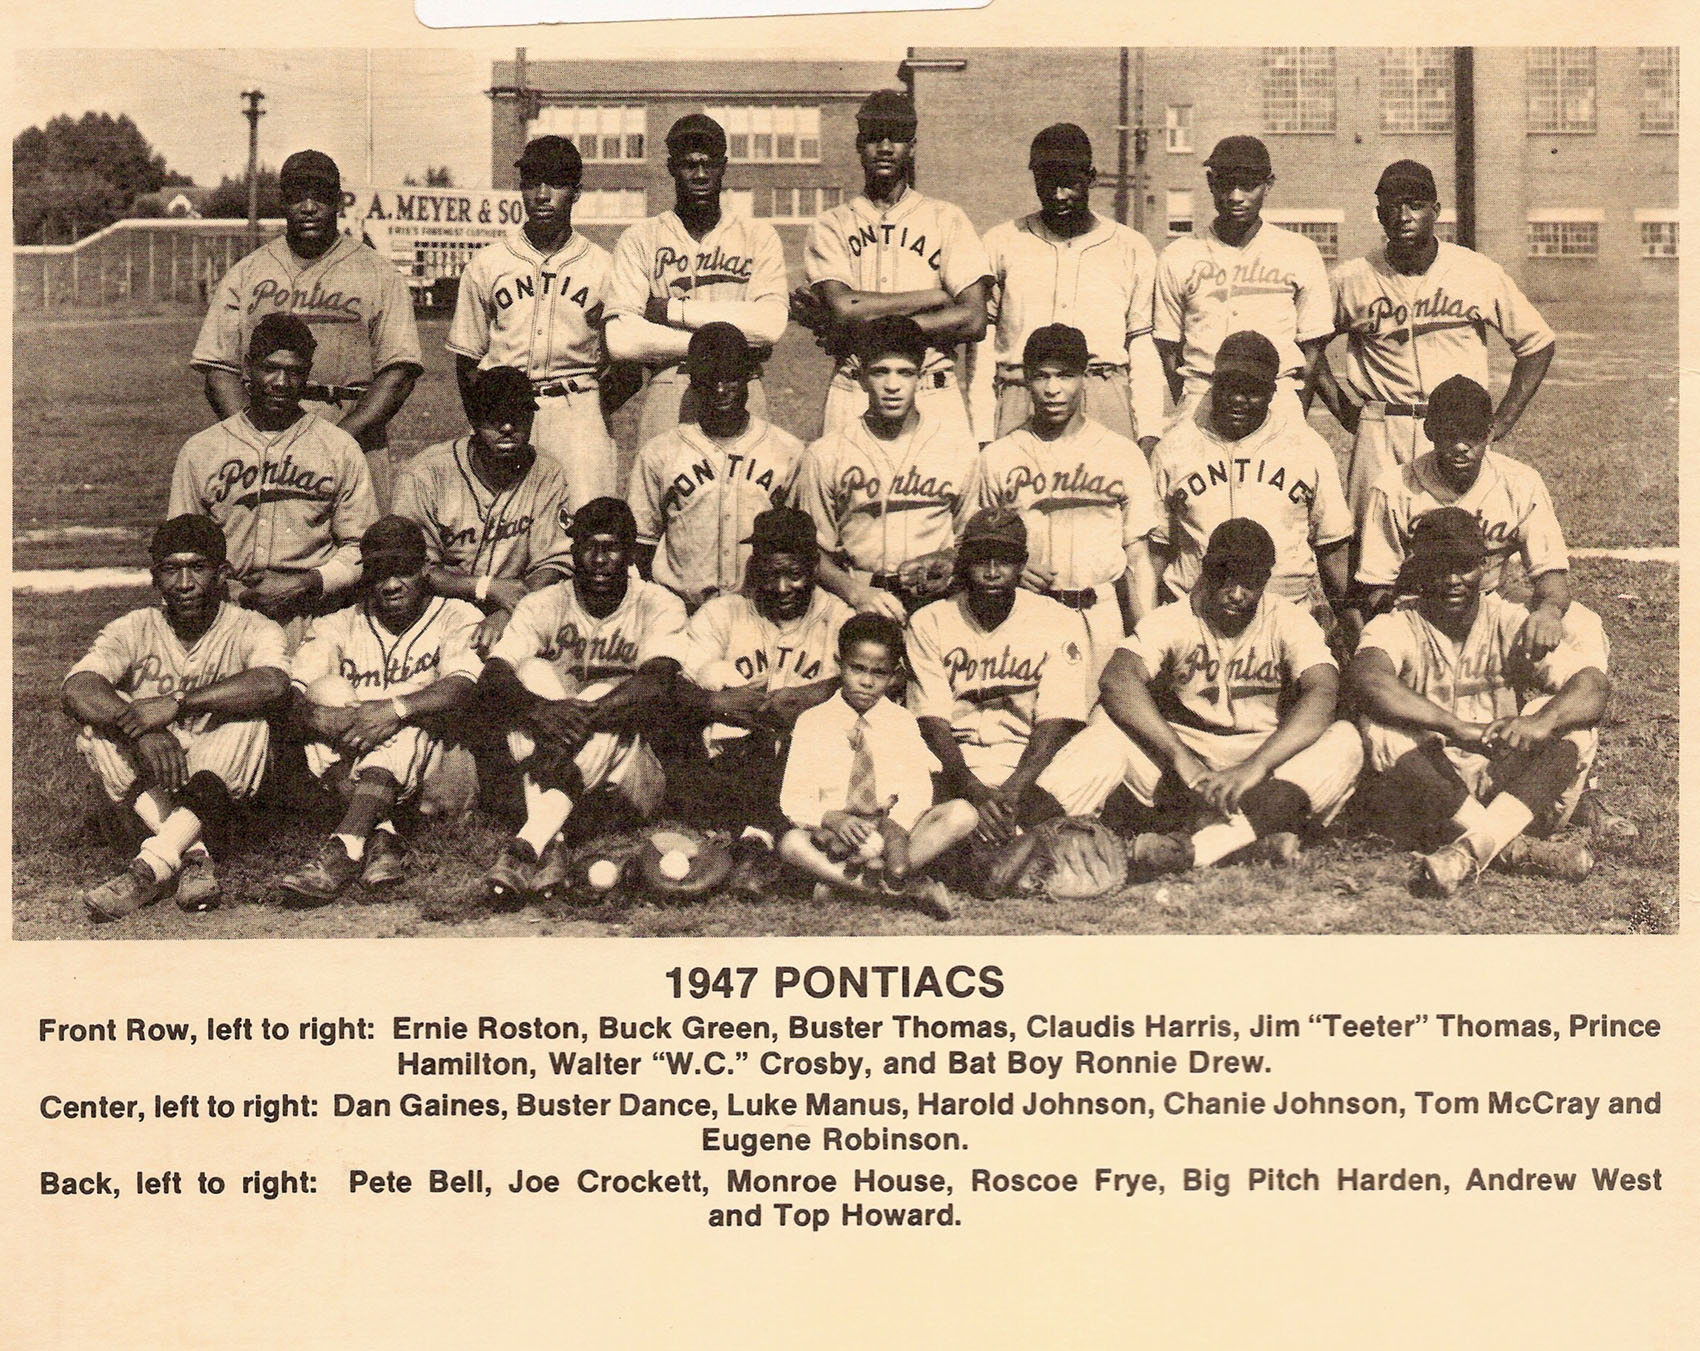 Pontiacs 1947